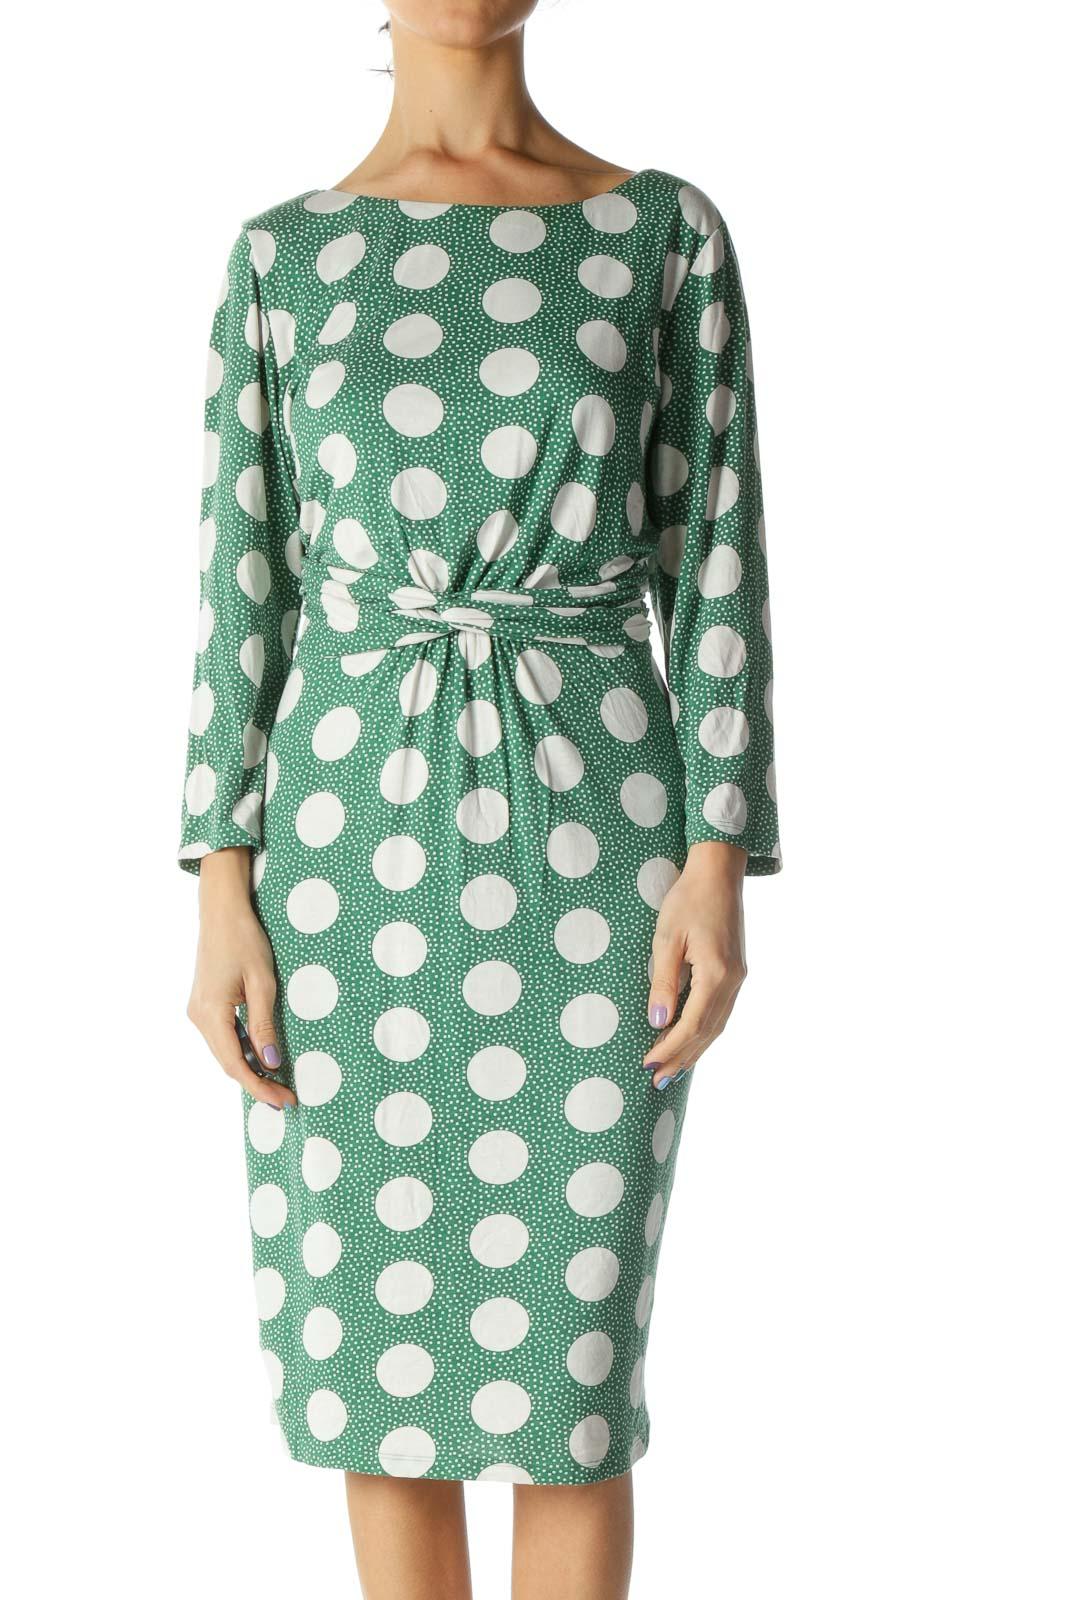 Green White Polka Dot Dress